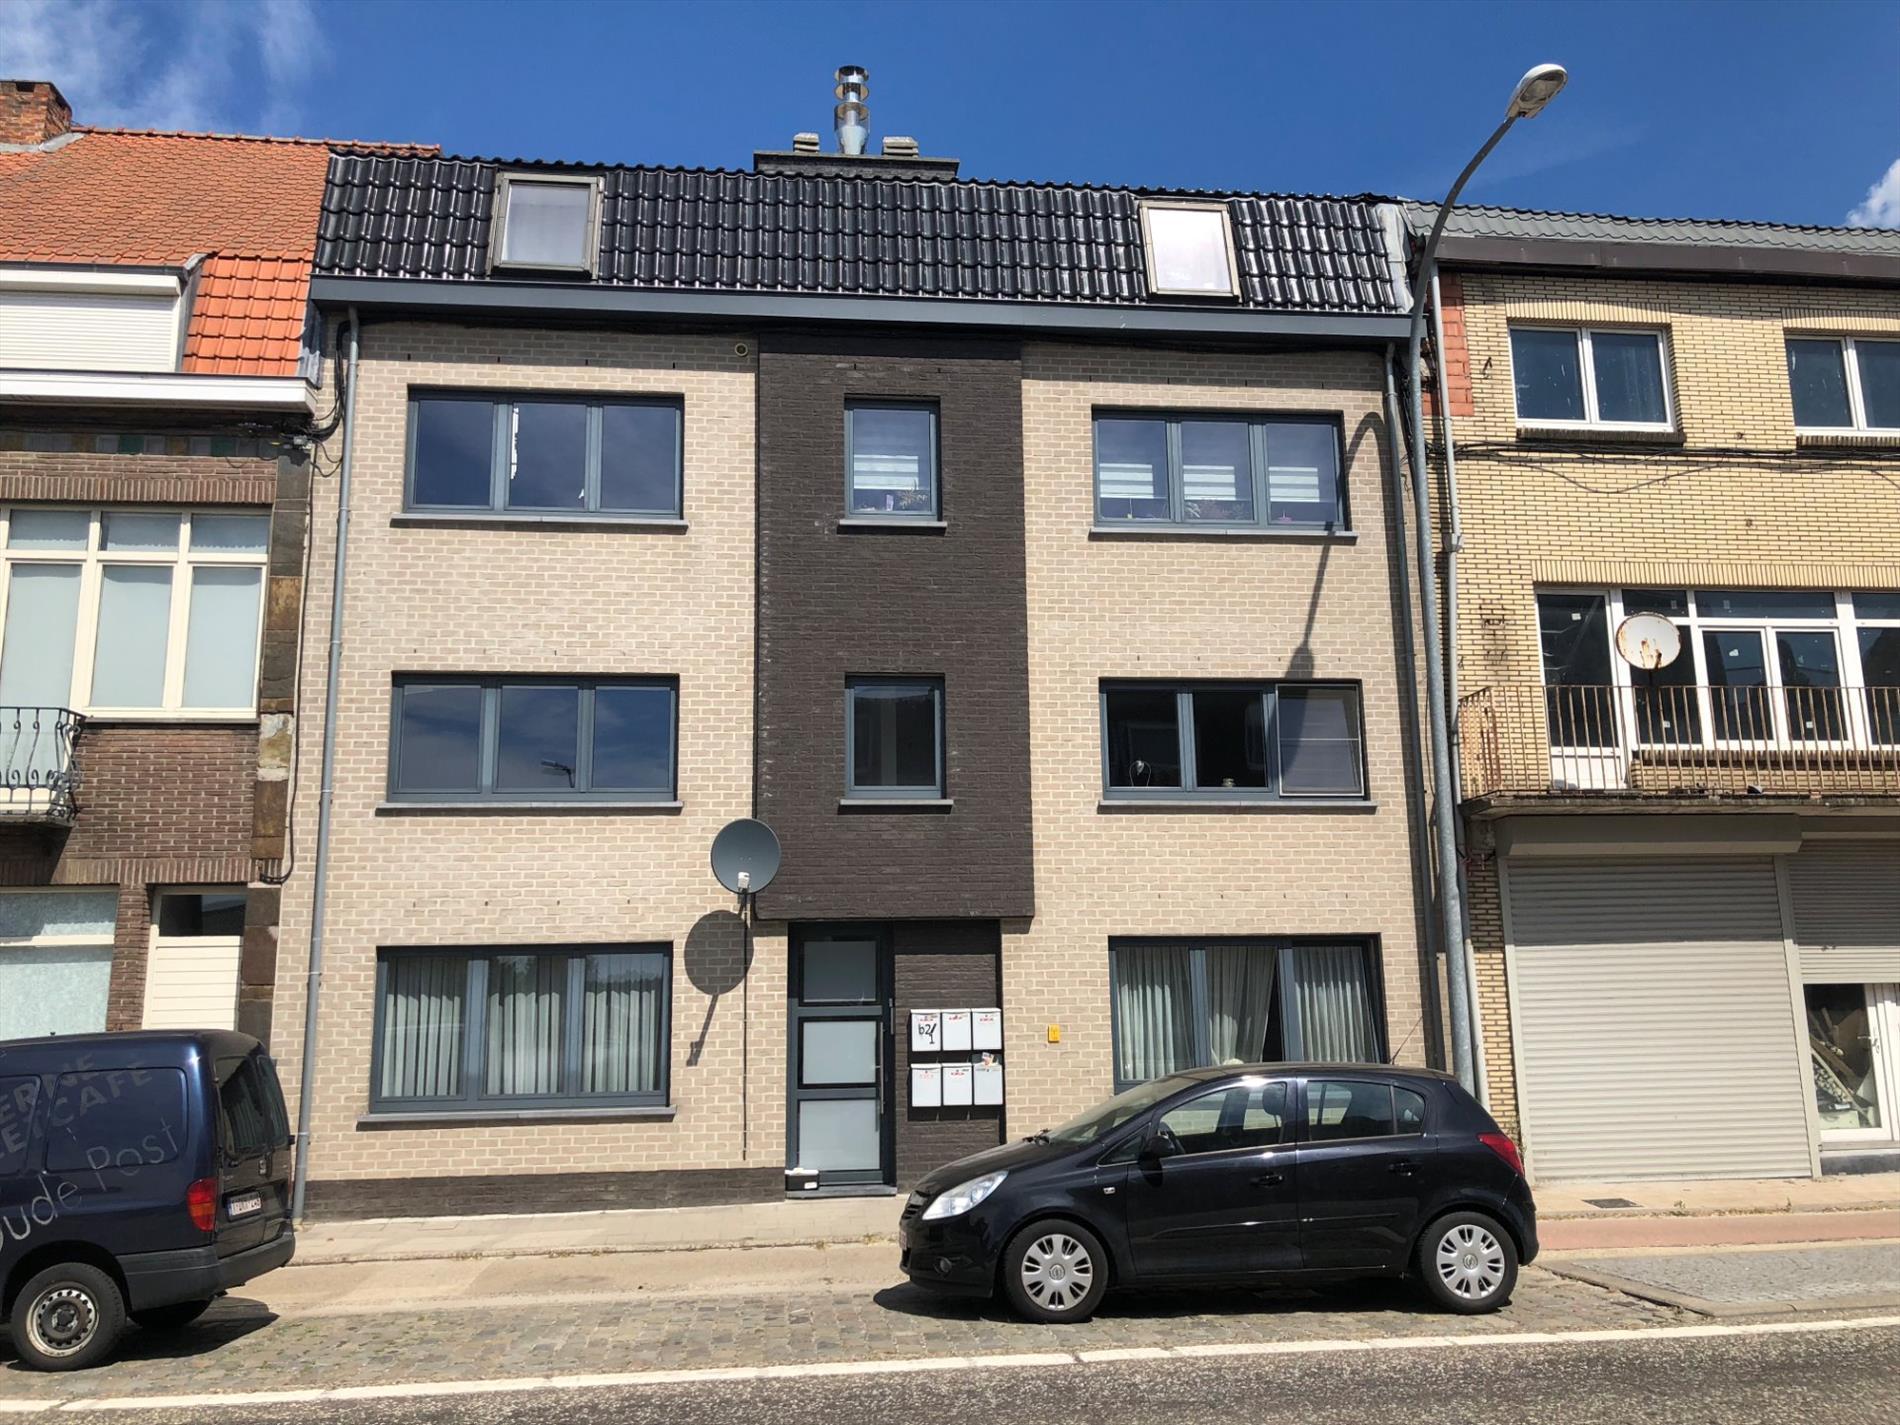 Diestersteenweg 62 Leopoldsburg